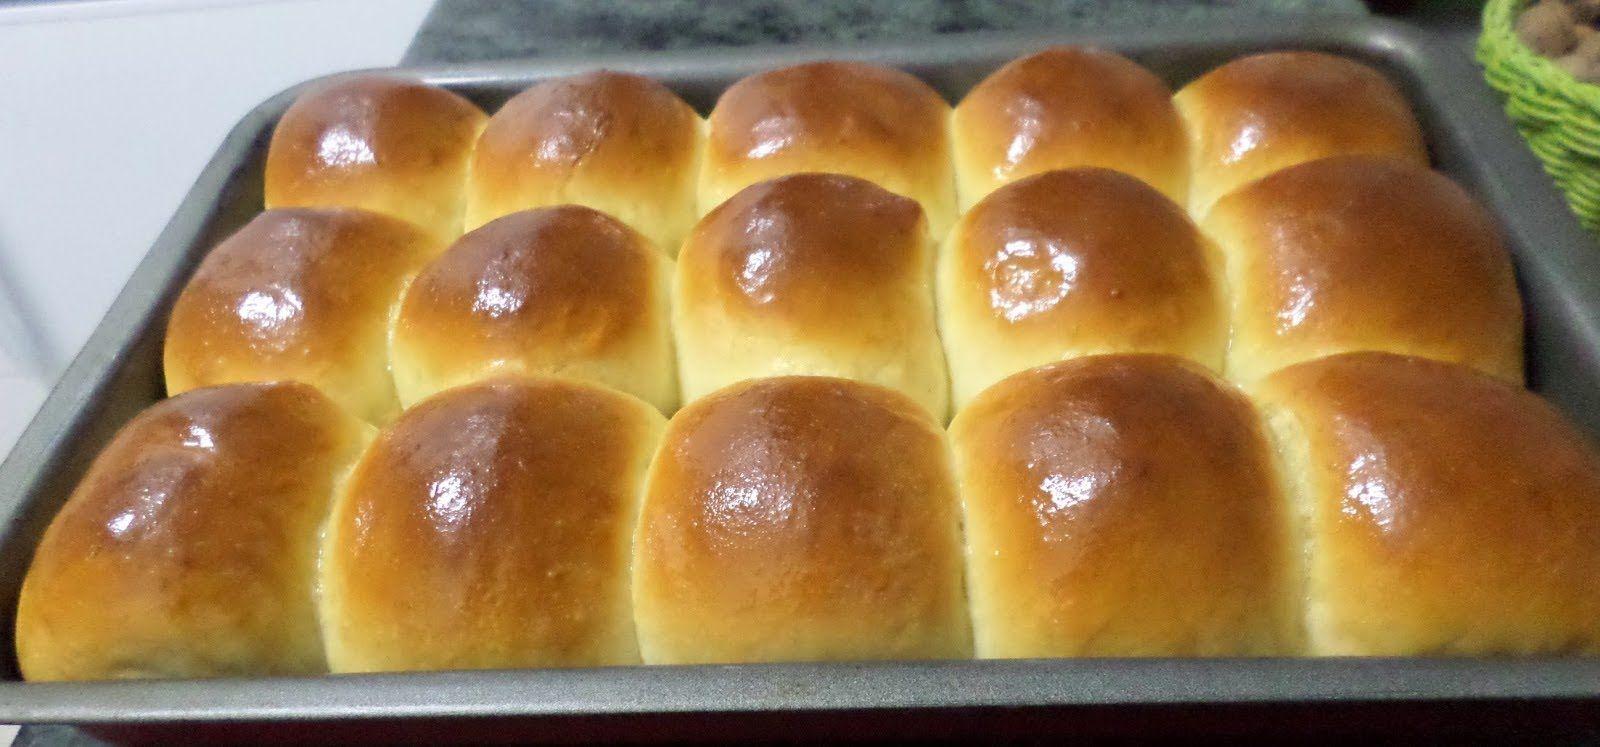 Colchones de Naranja - Pan Dulce en 2020 | Pan de dulce